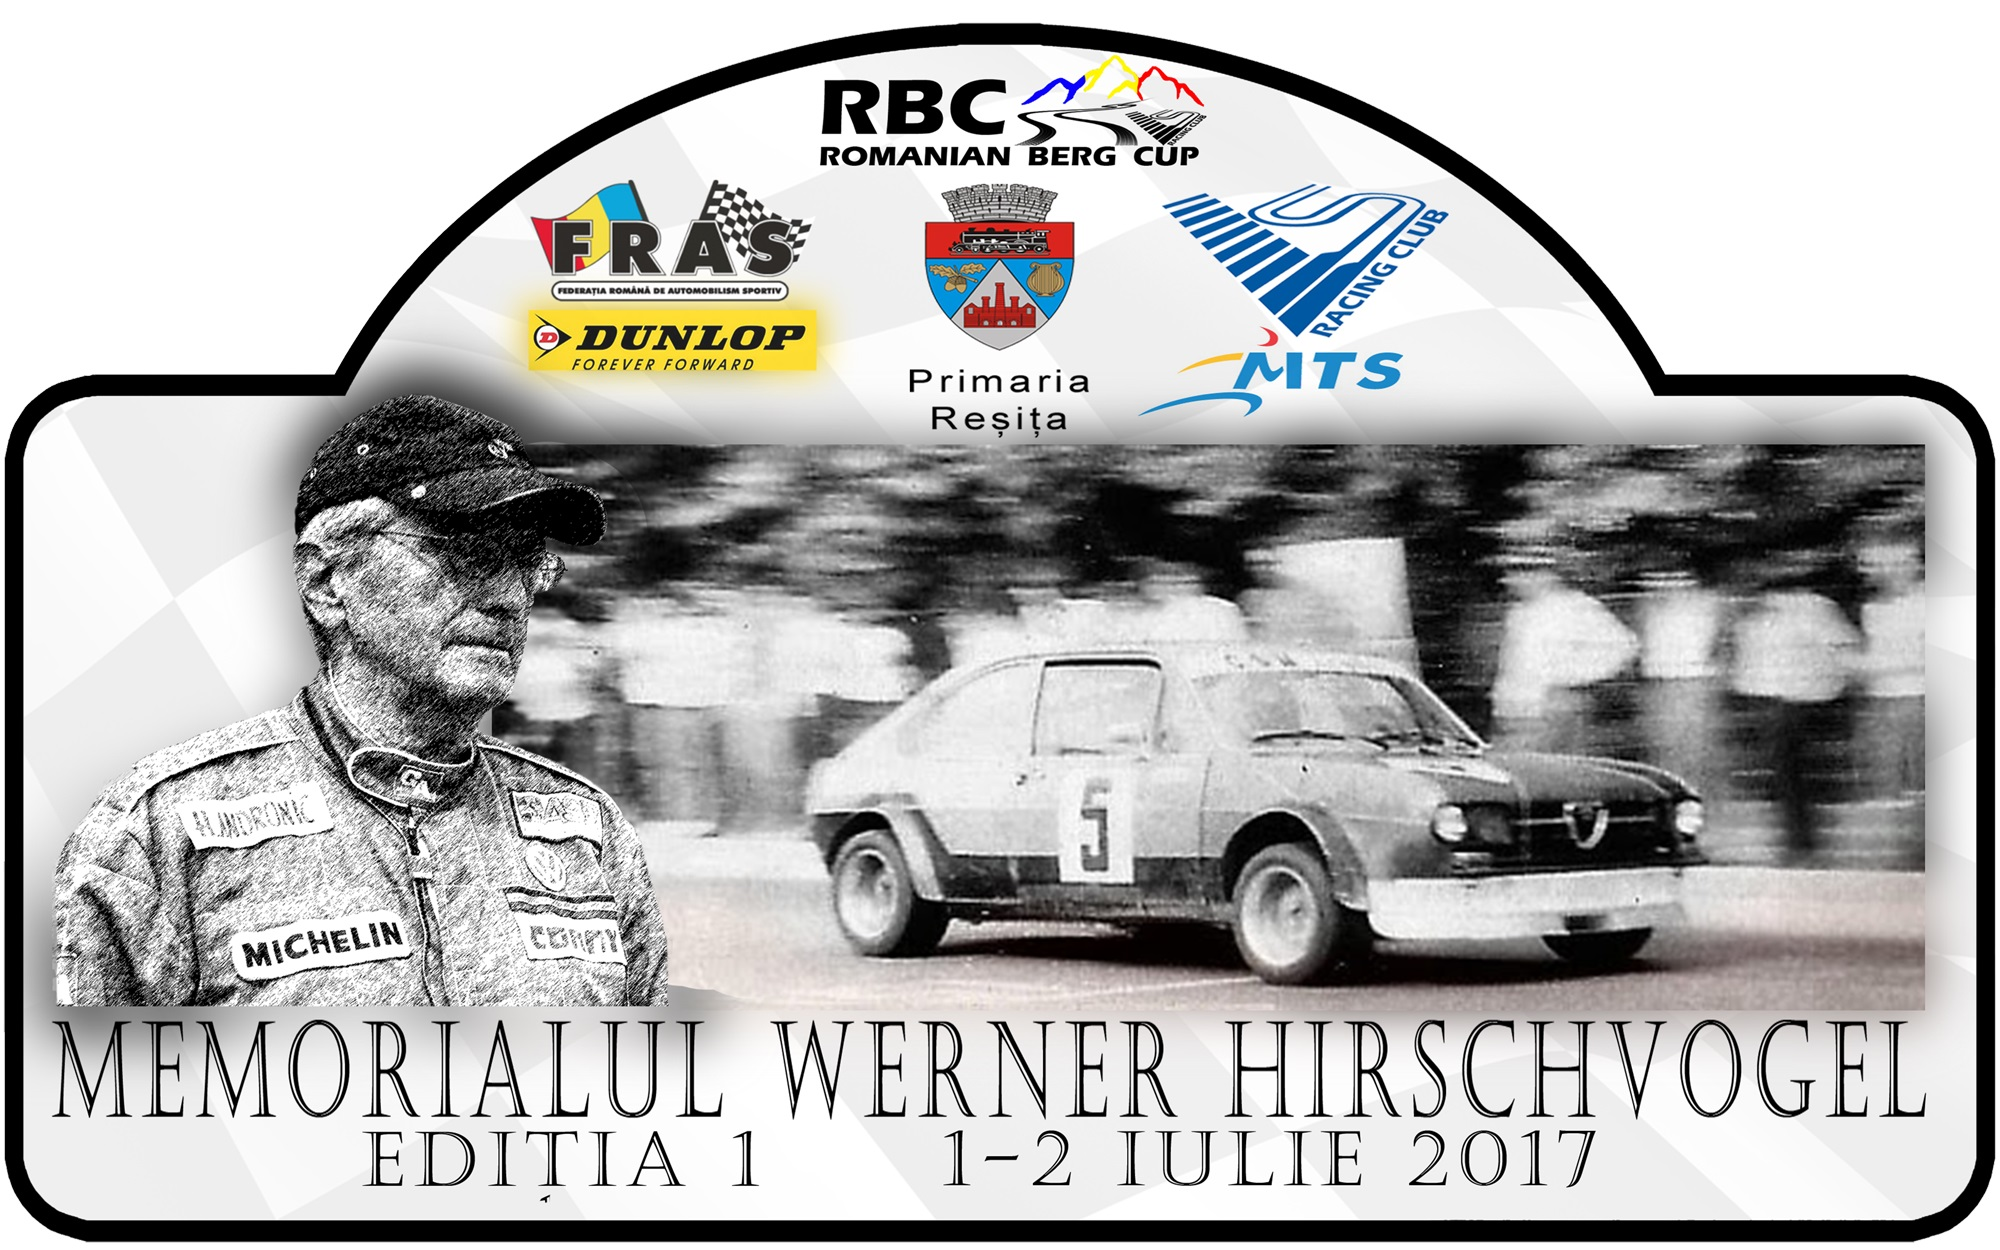 Rezultate finale Memorialul Werner Hirschvogel